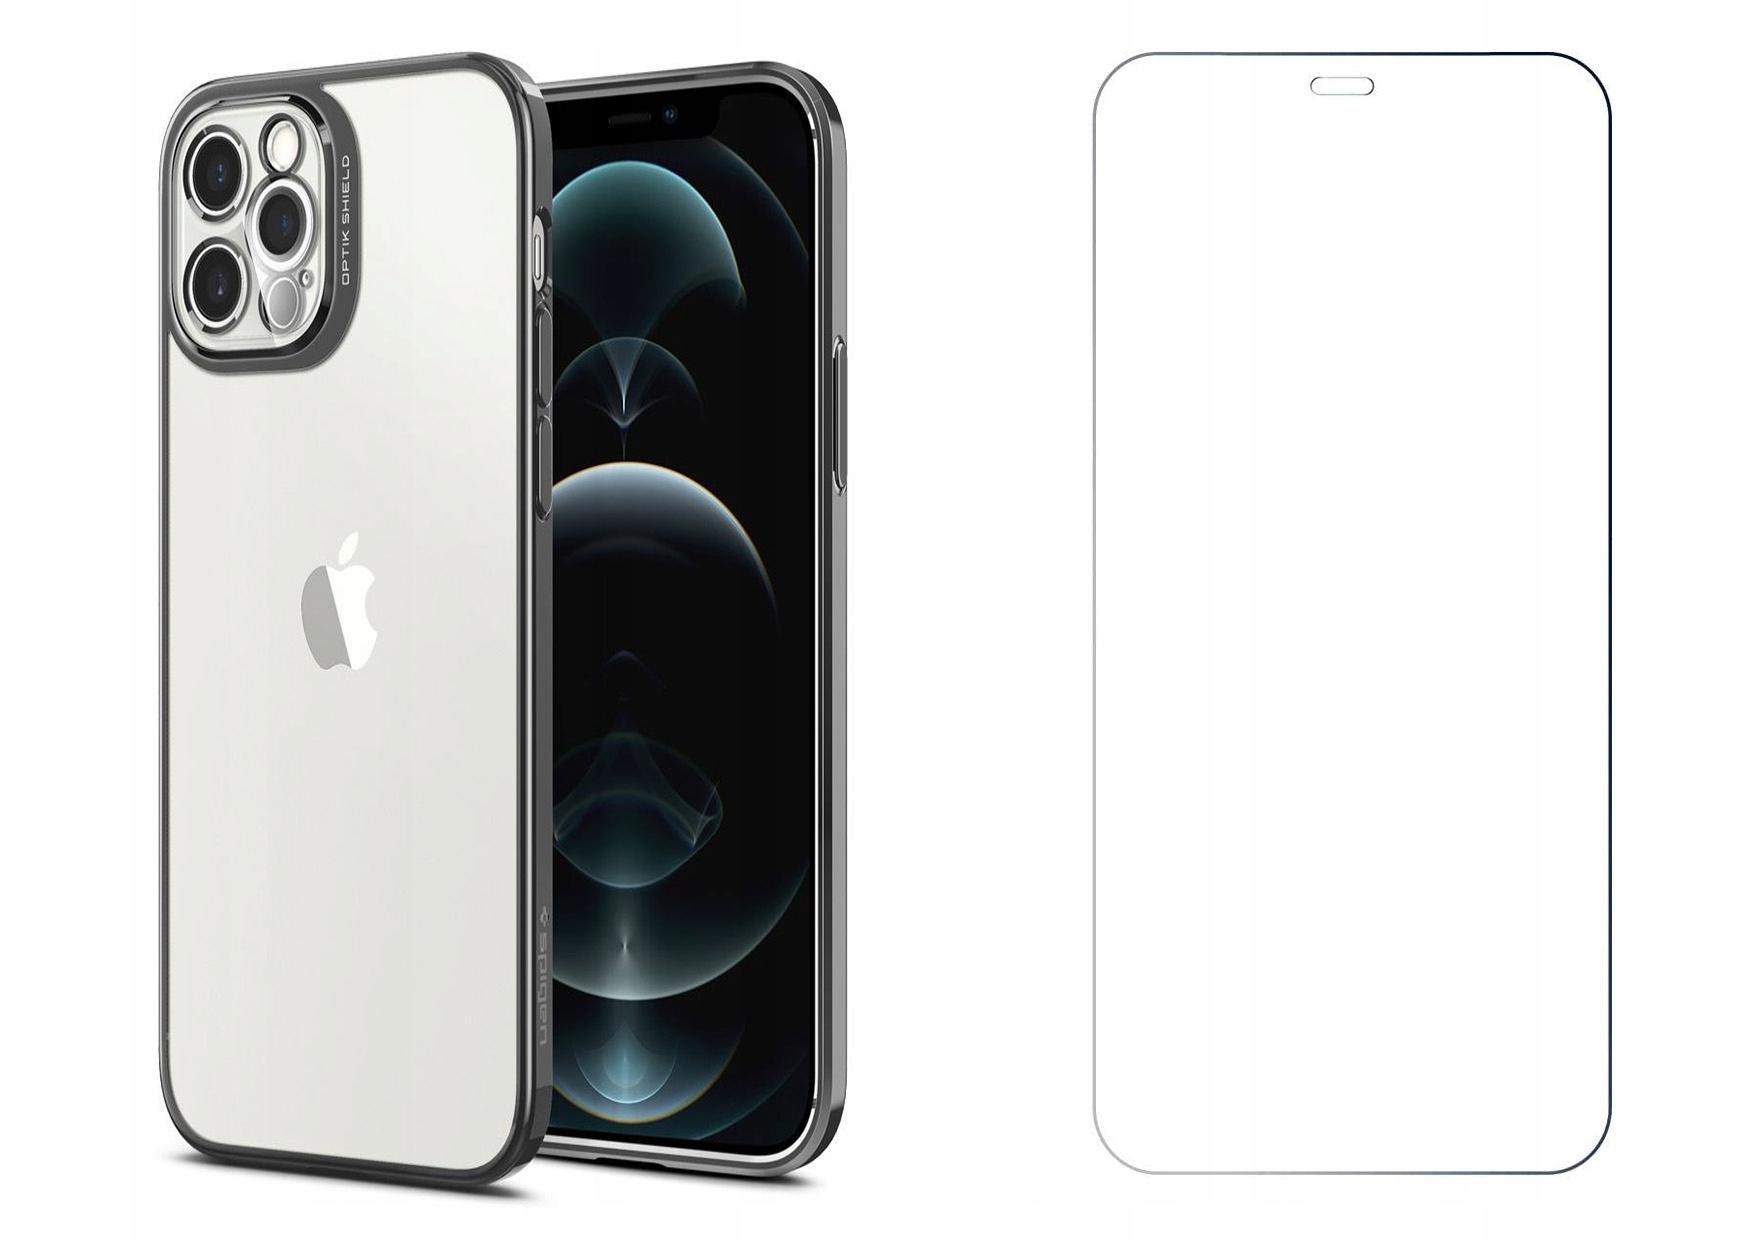 Etui Spigen Optik Crystal + Szkło do iPhone 12 Pro